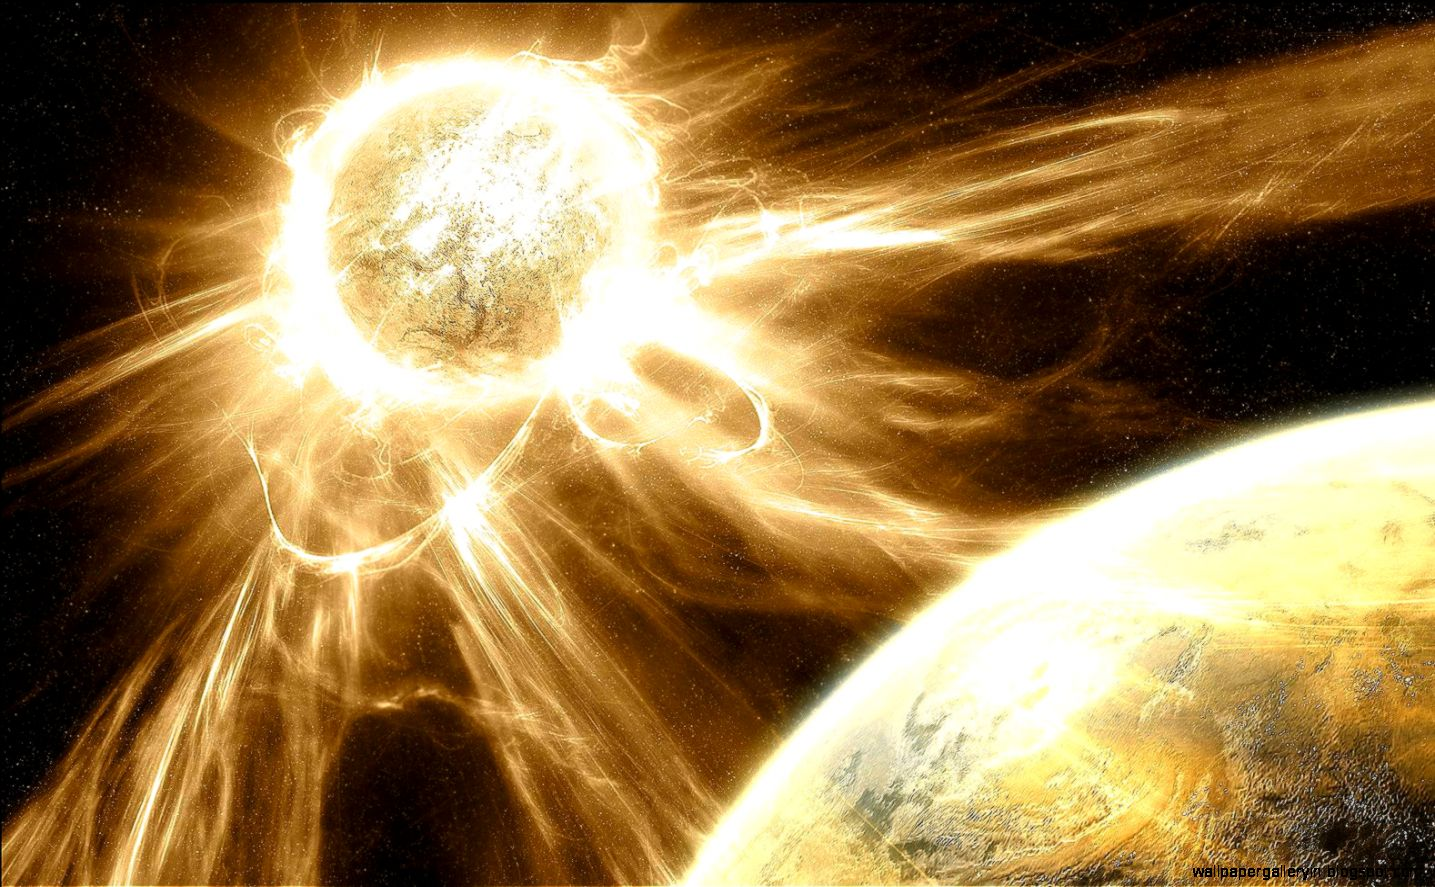 Space Art Supernova Hd Wallpapers